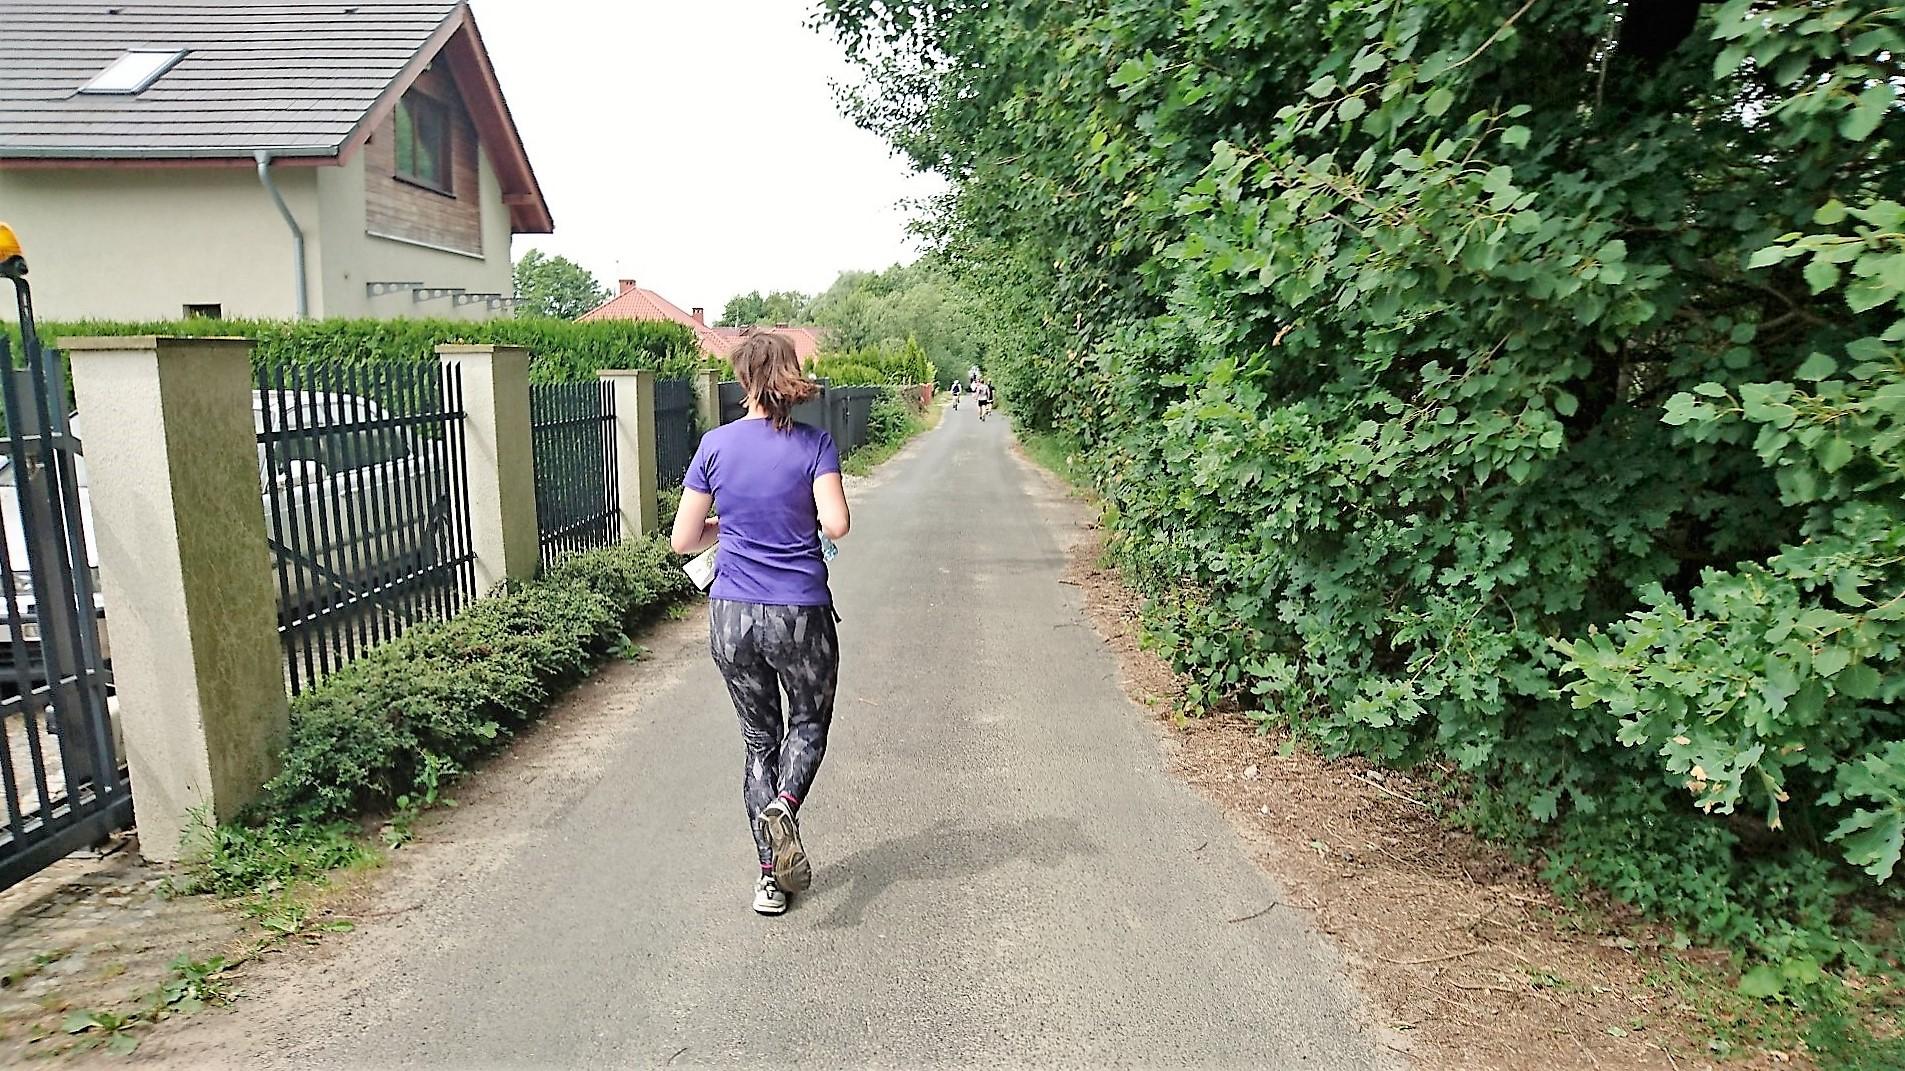 ćwierćmaraton bociana 2016 drga asfaltowa